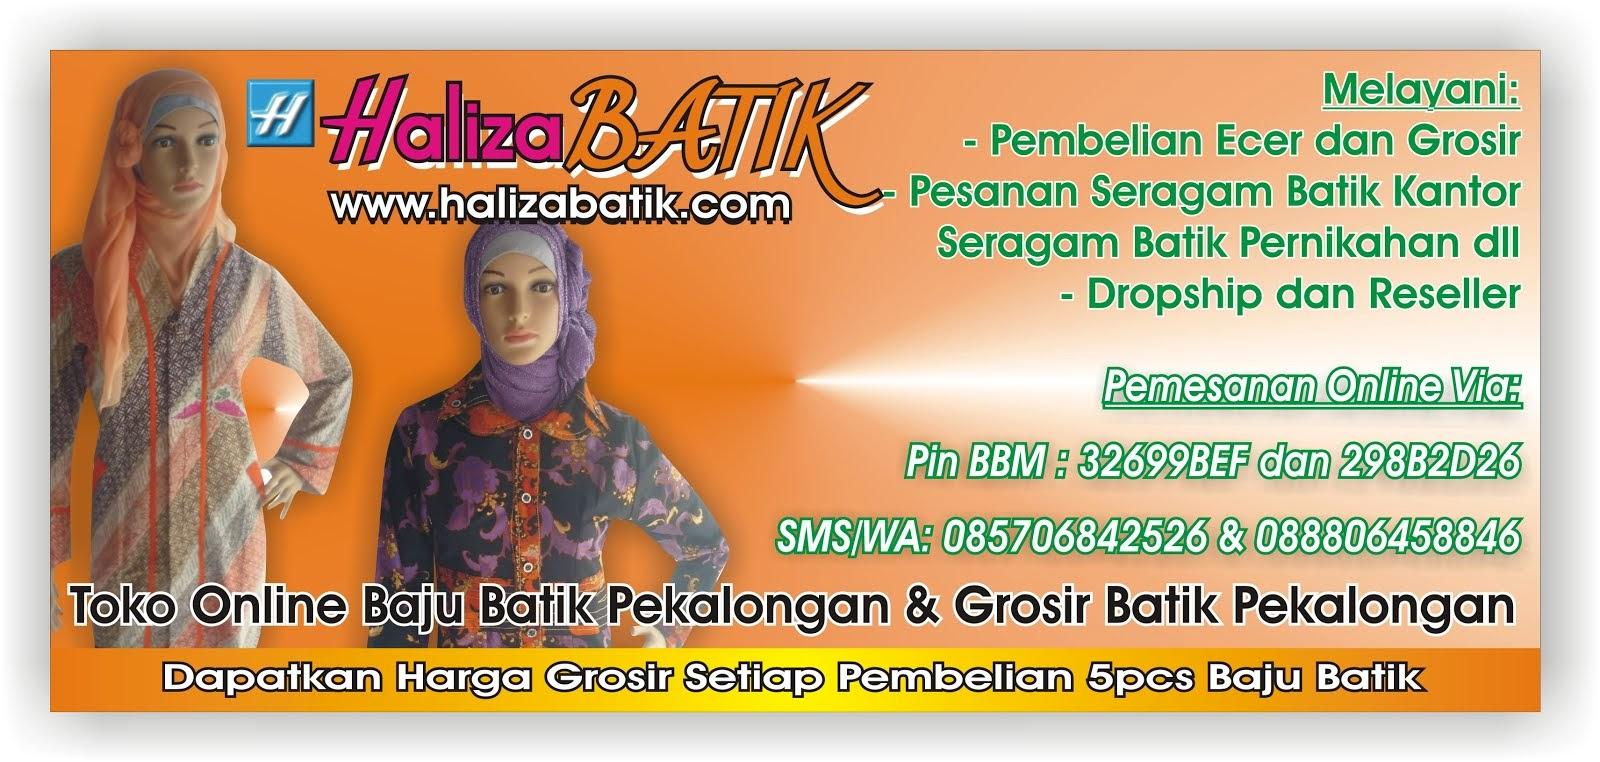 model baju kerja wanita, Motif Batik Nusantara